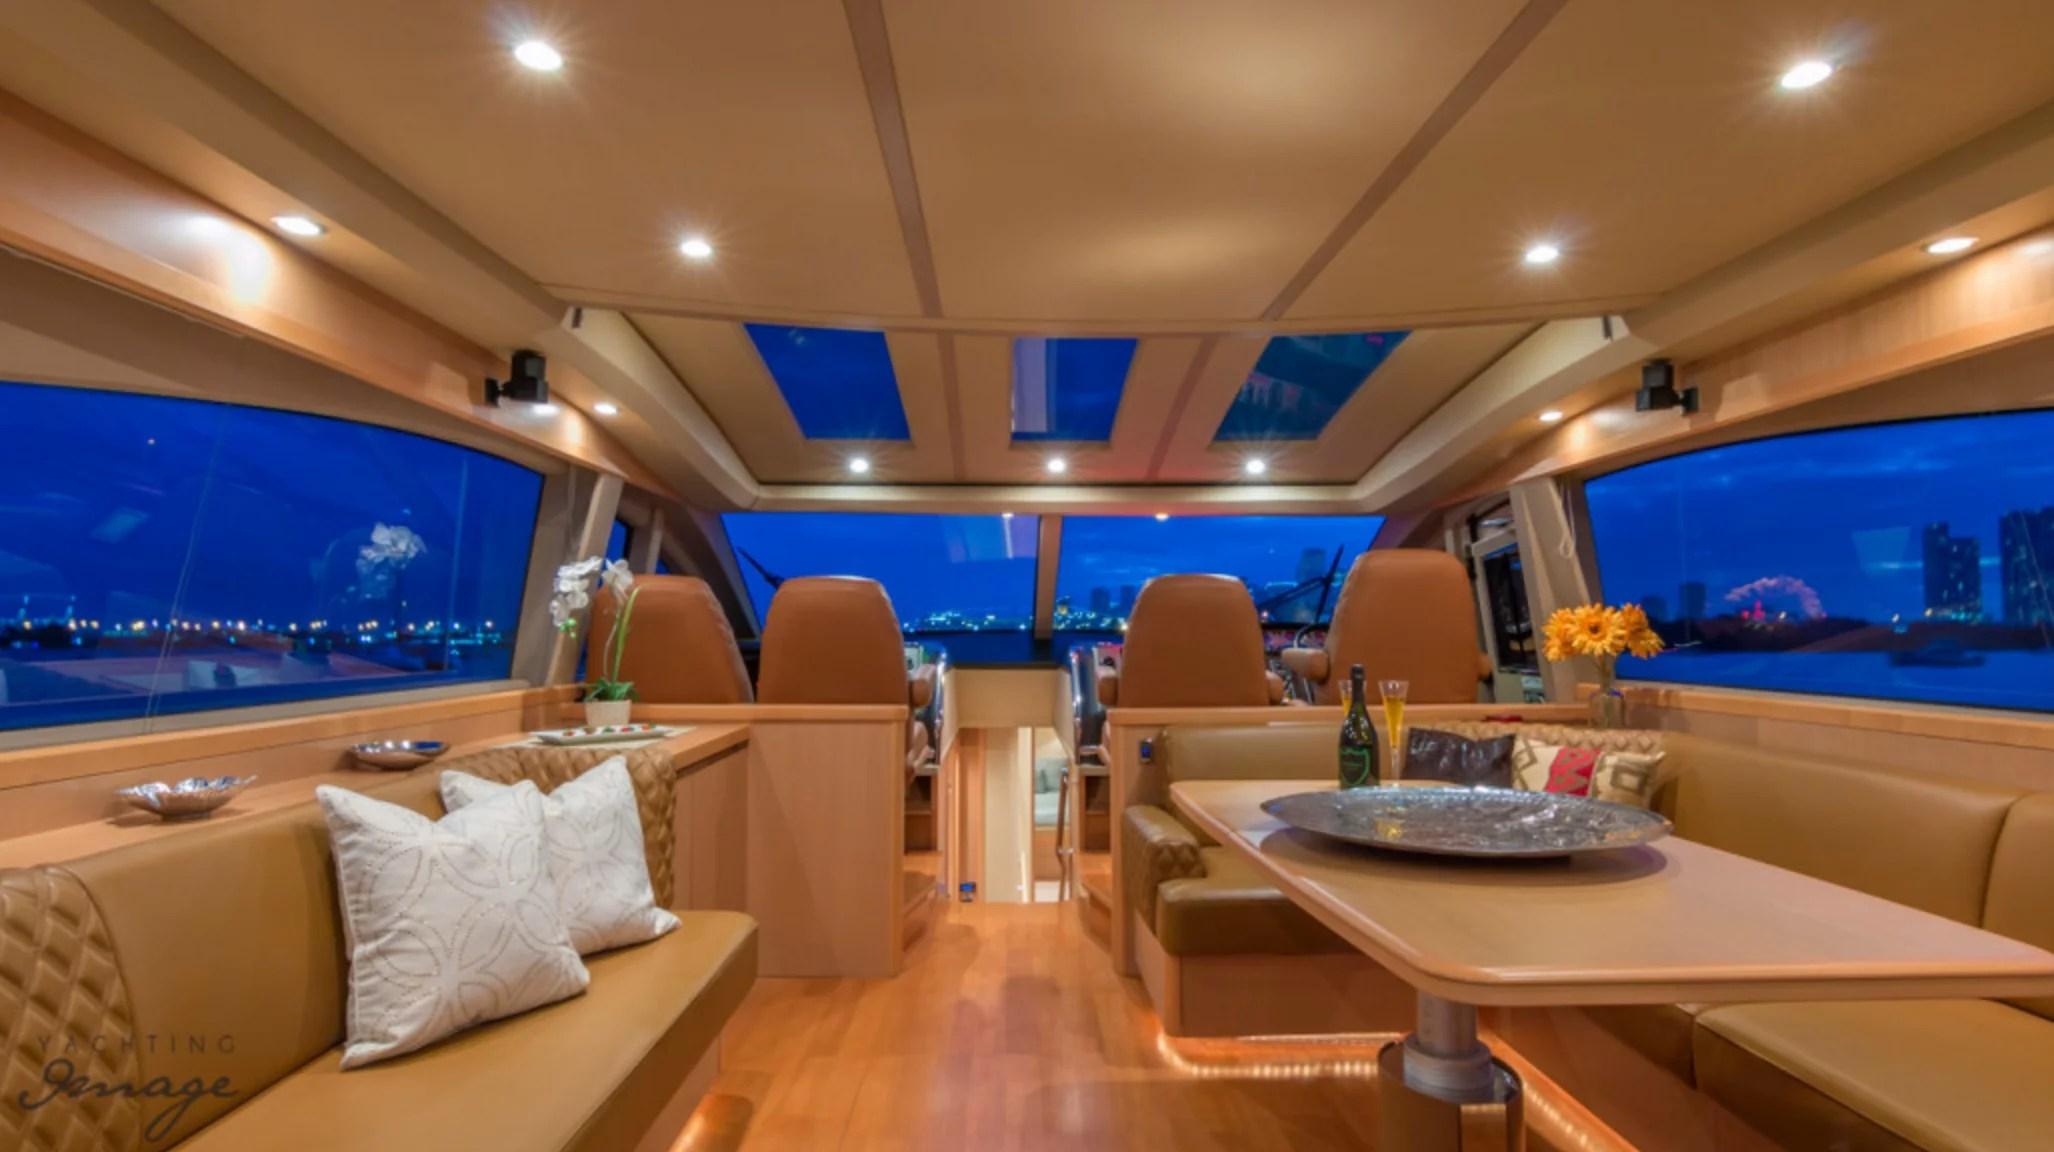 Contact Us Prime Luxury Rentals